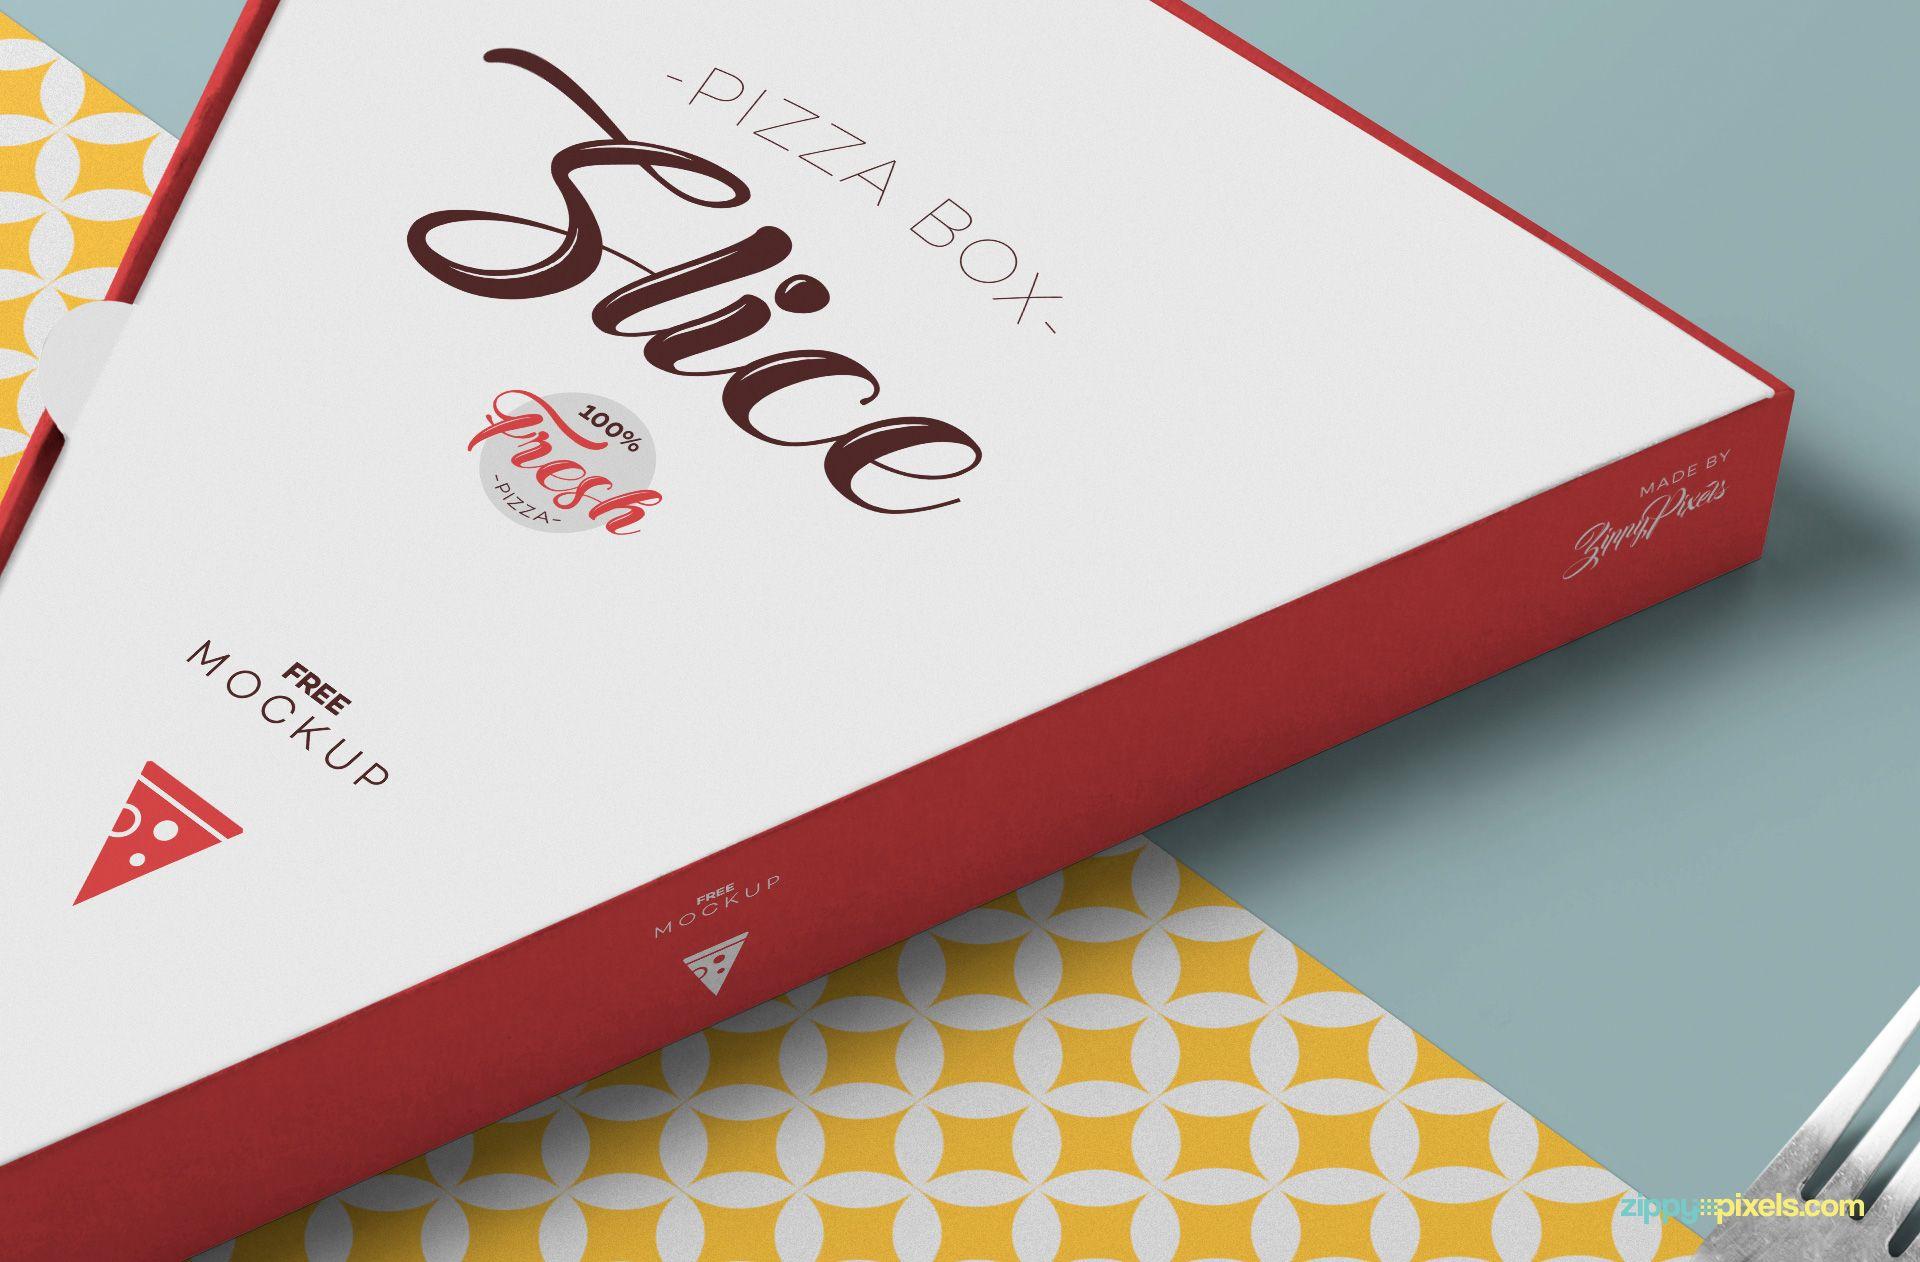 Download Free Pizza Slice Box Mockup Zippypixels Packaging Mockup Mockup Pizza Slice